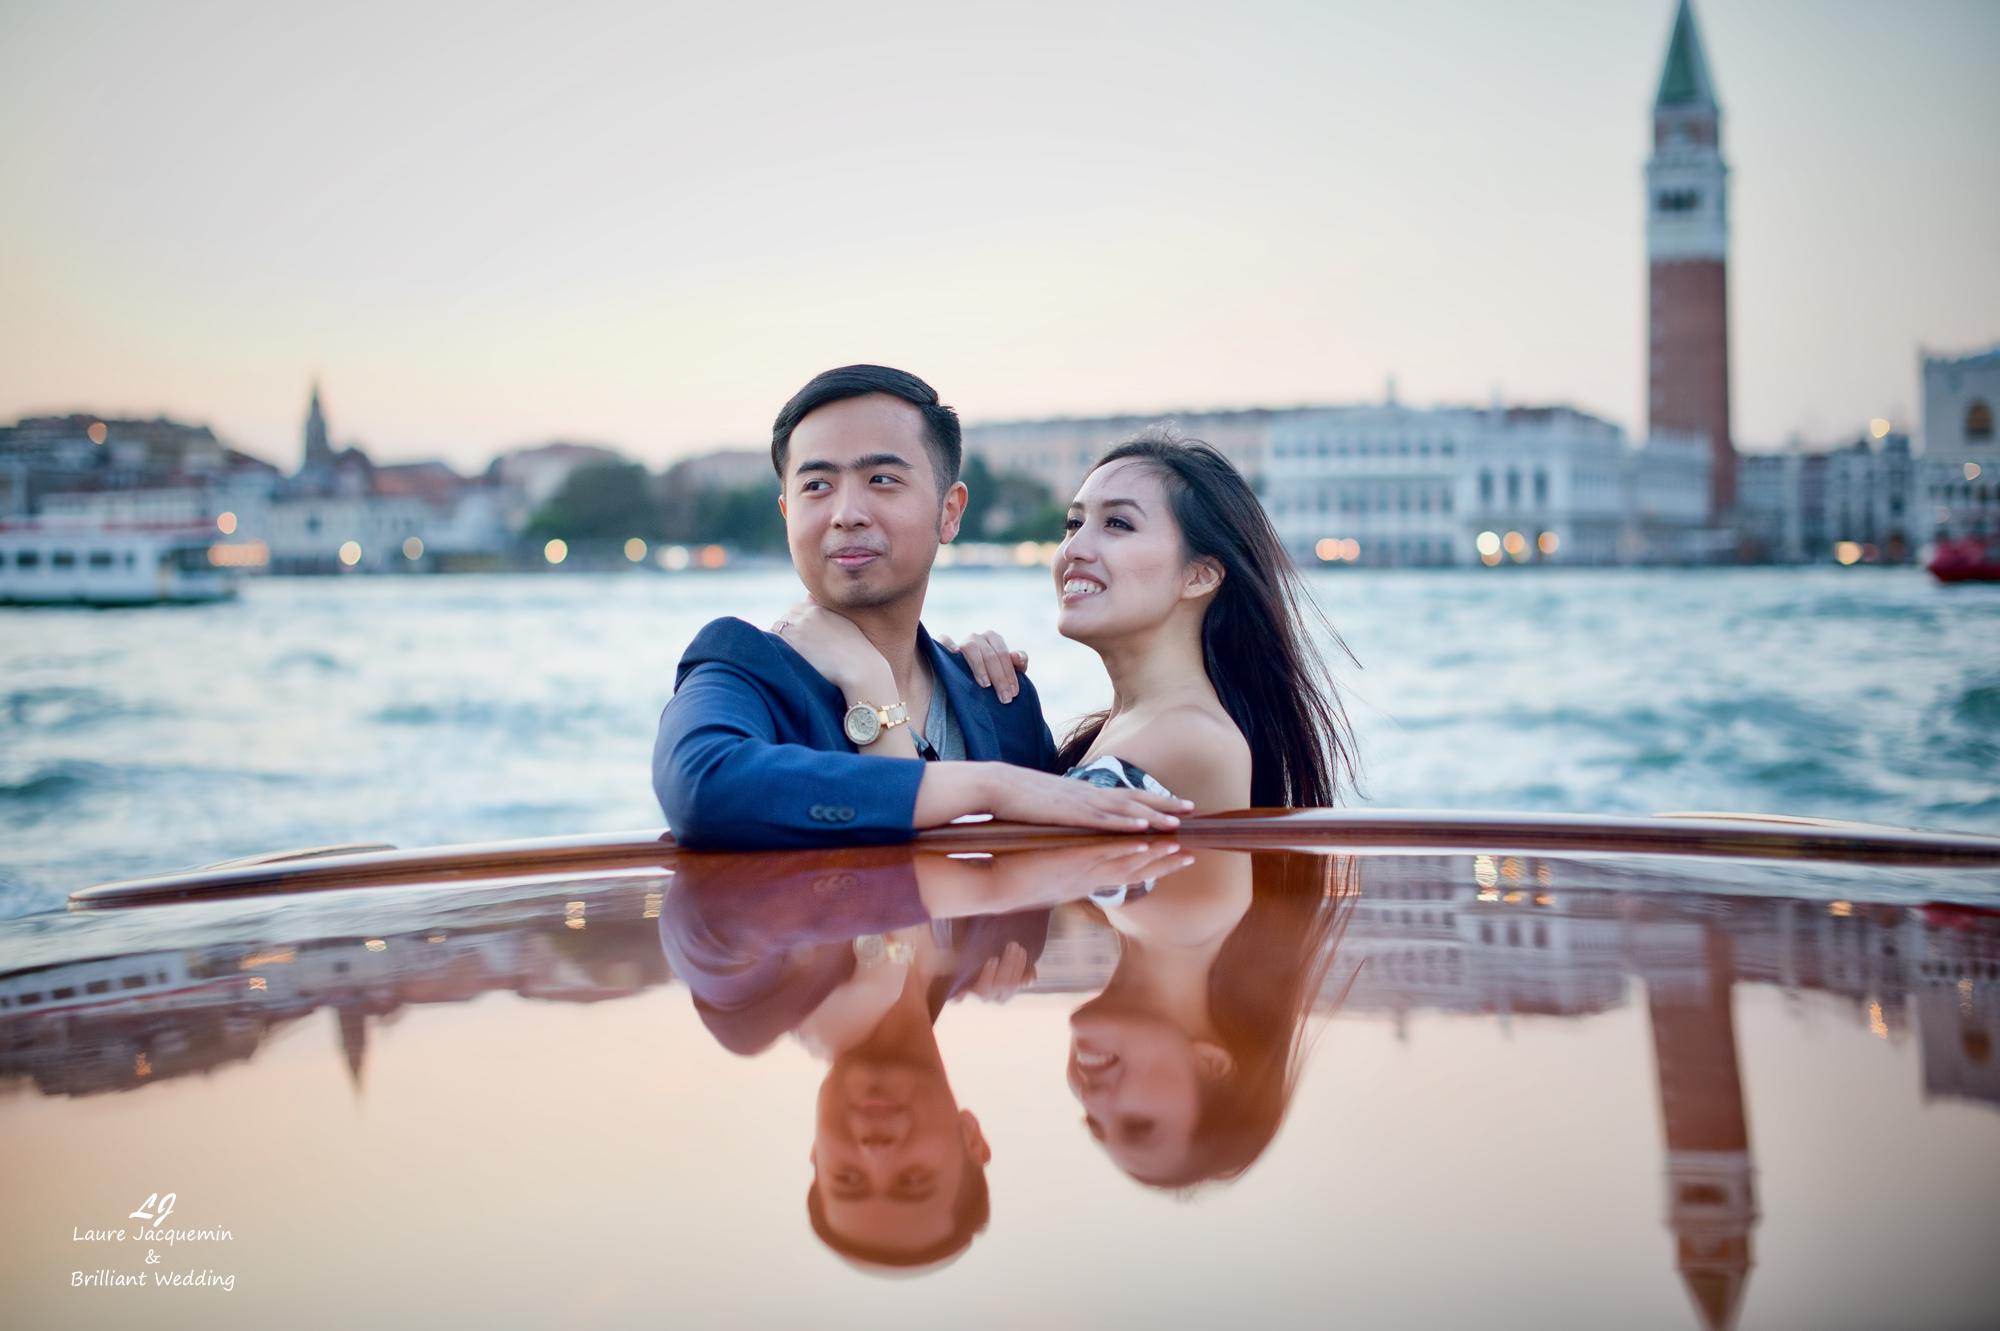 Venezia fotografo proposta matrimonio laure jacquemin (62) copia